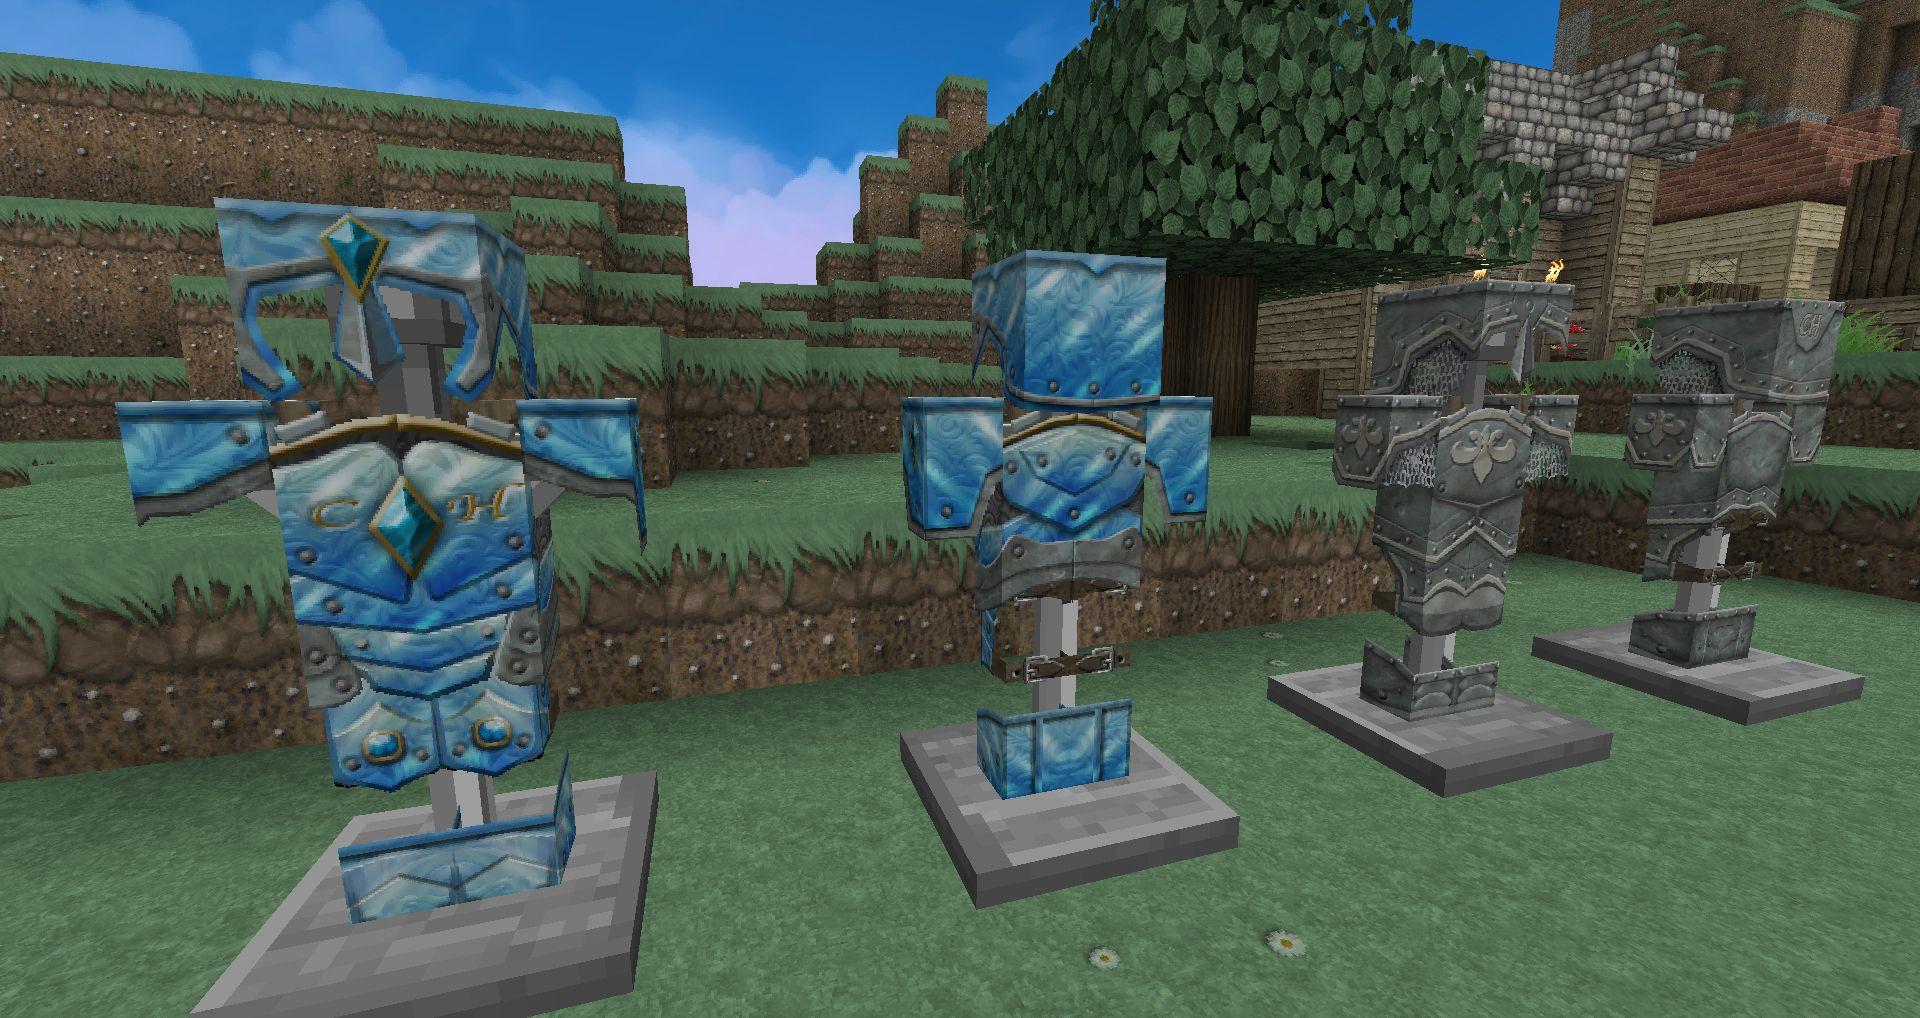 моды для майнкрафт | minecraft 1 8 8